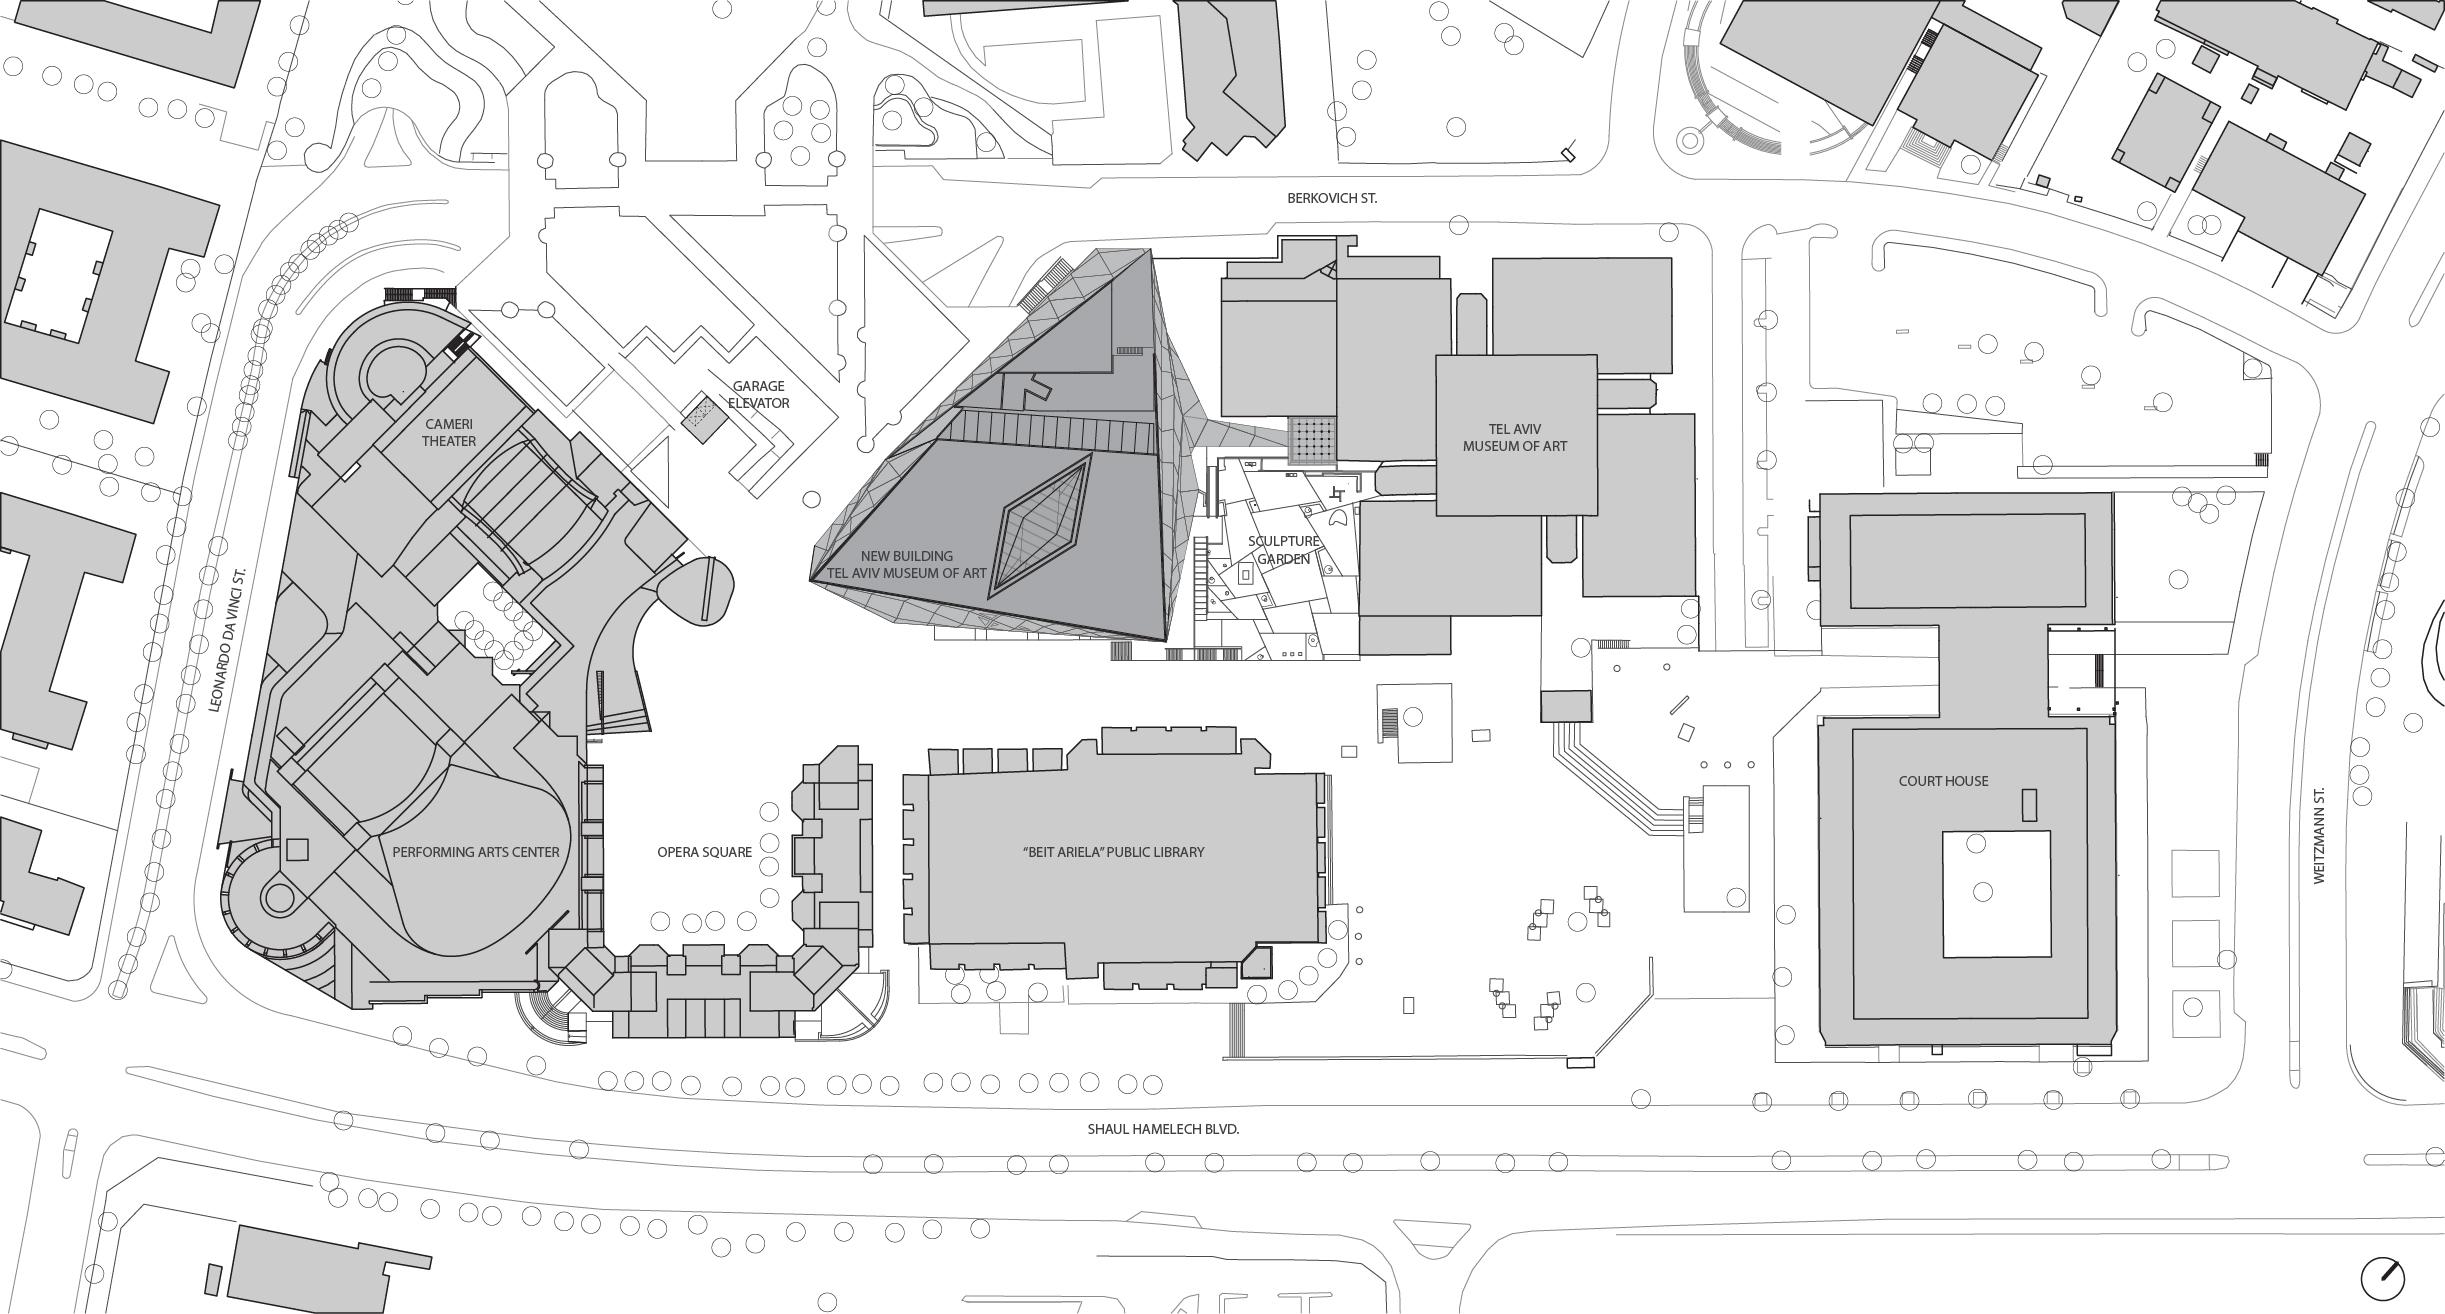 Tel Aviv Museum site plan